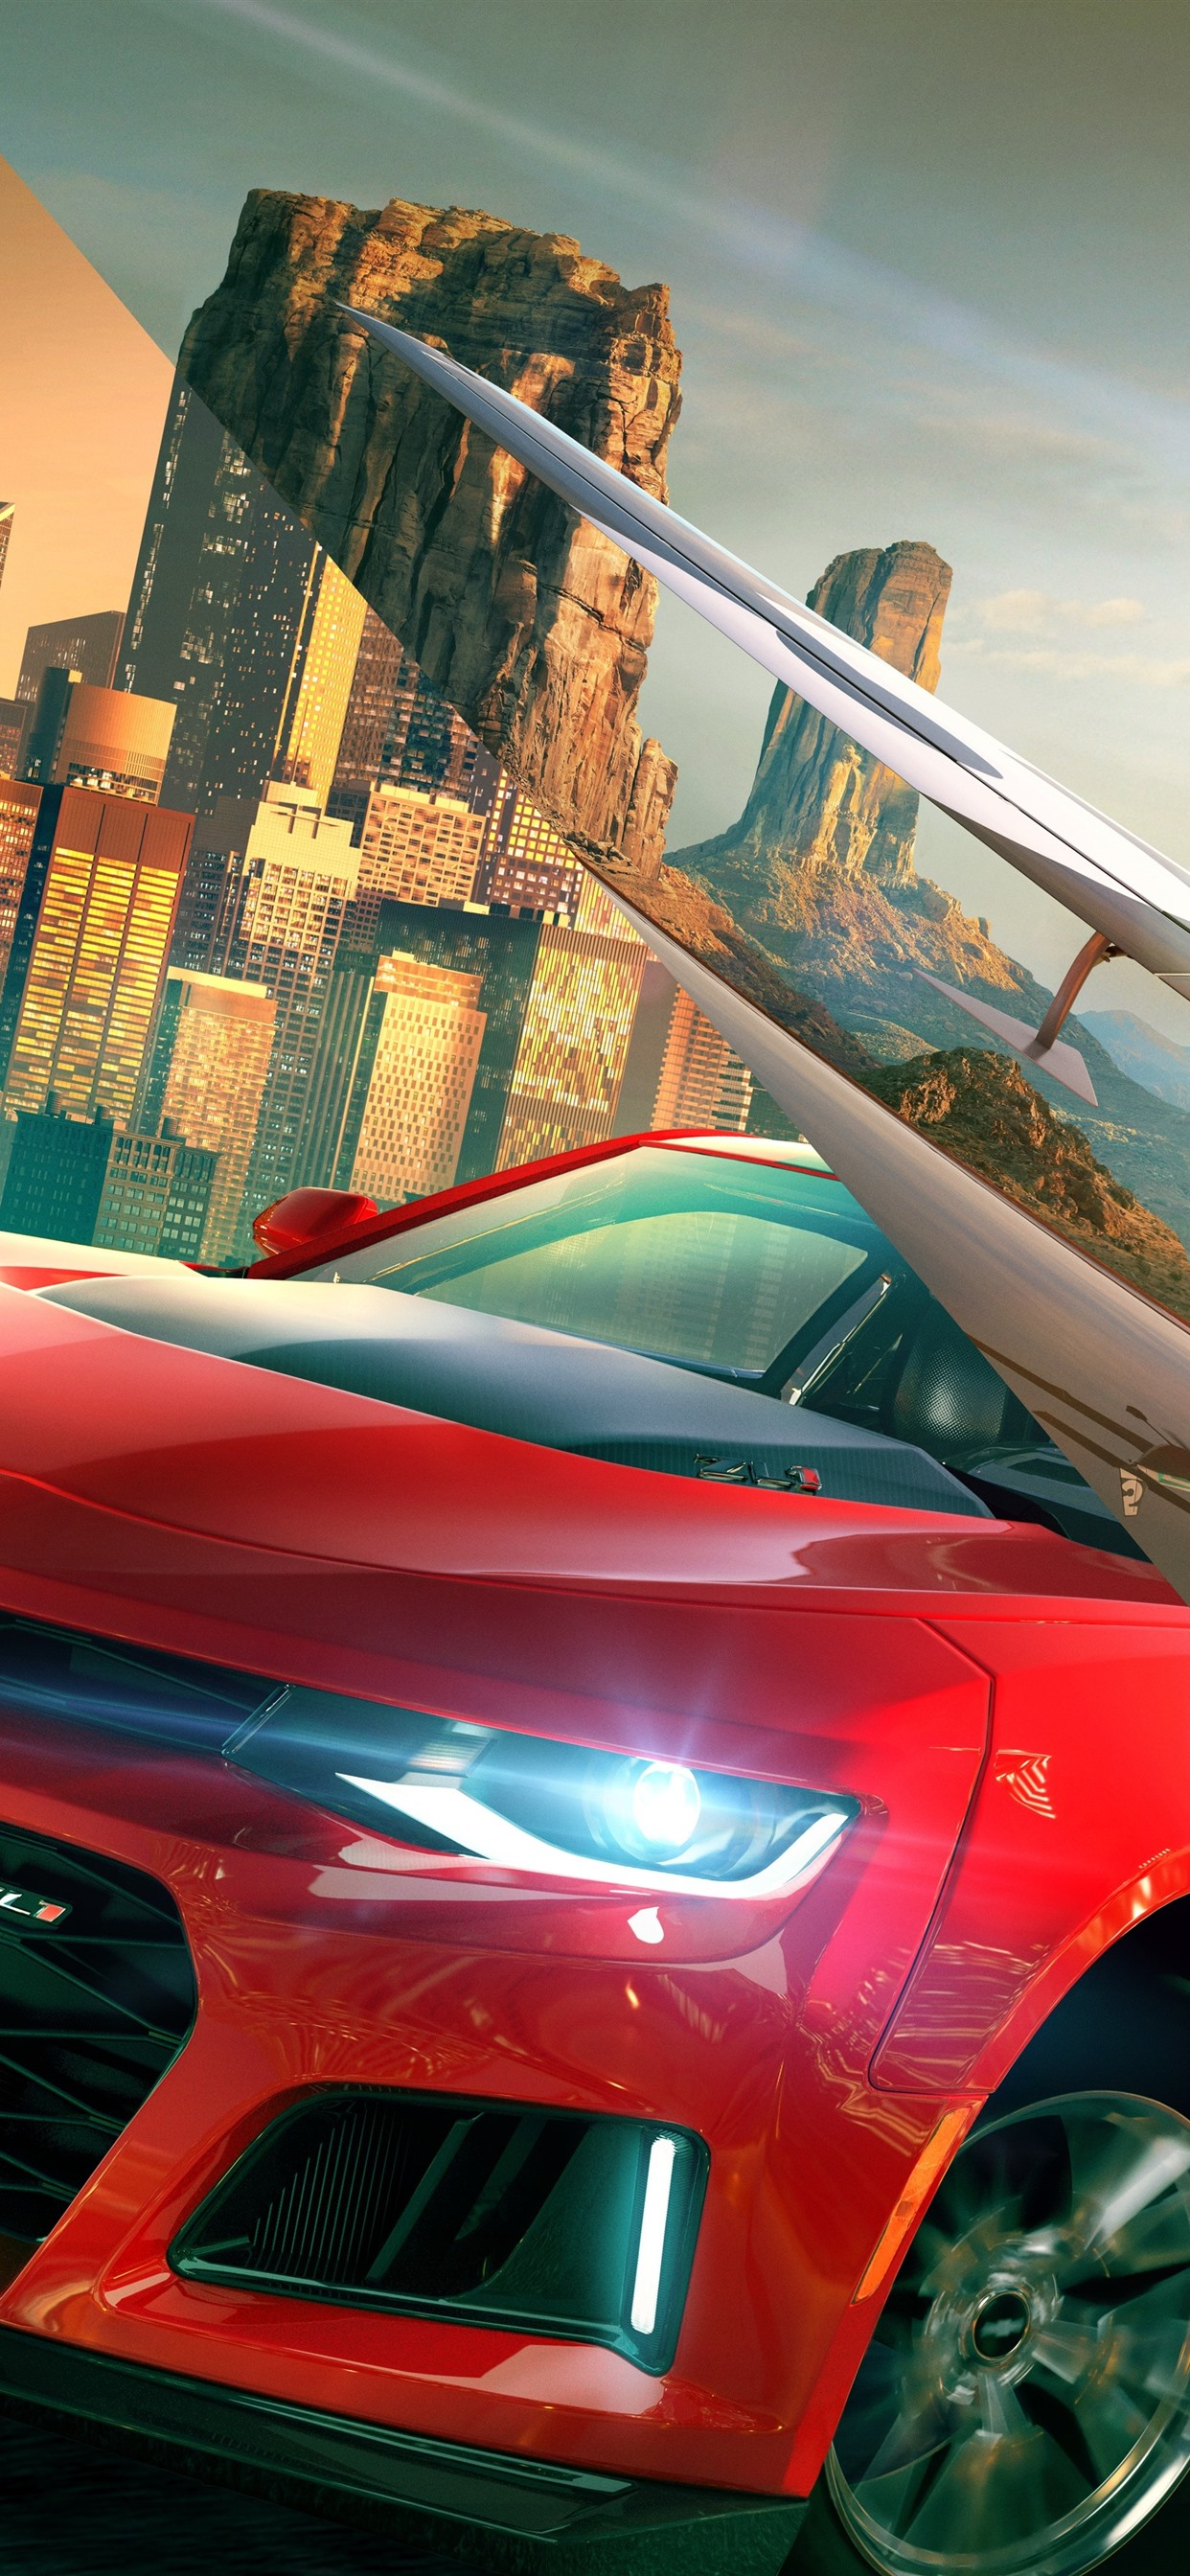 The Crew 2, Ubisoft game 1242x2688 iPhone XS Max wallpaper